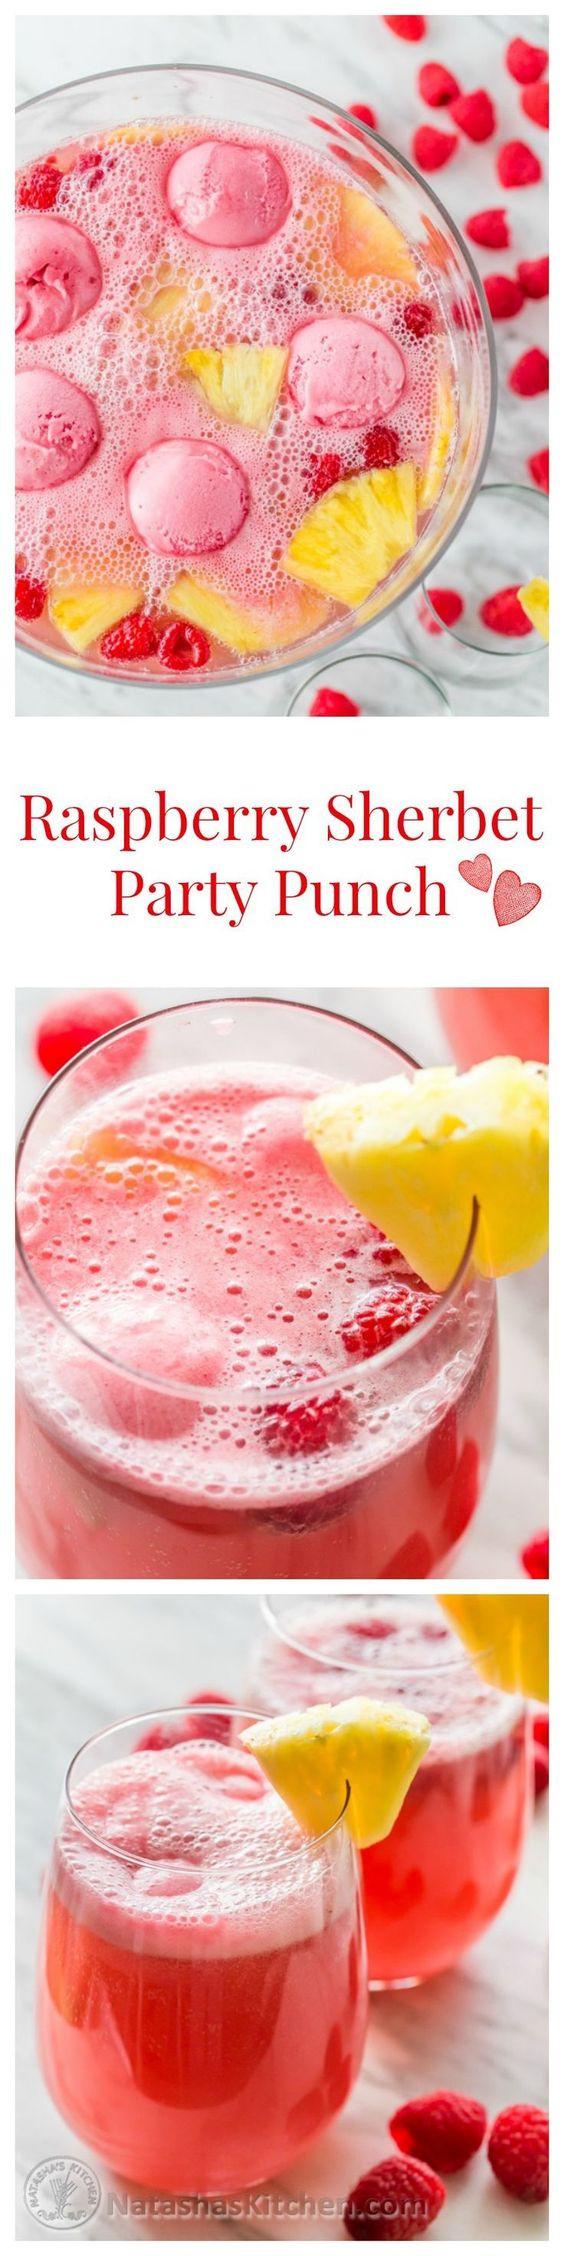 Raspberry Sherbert Party Punch